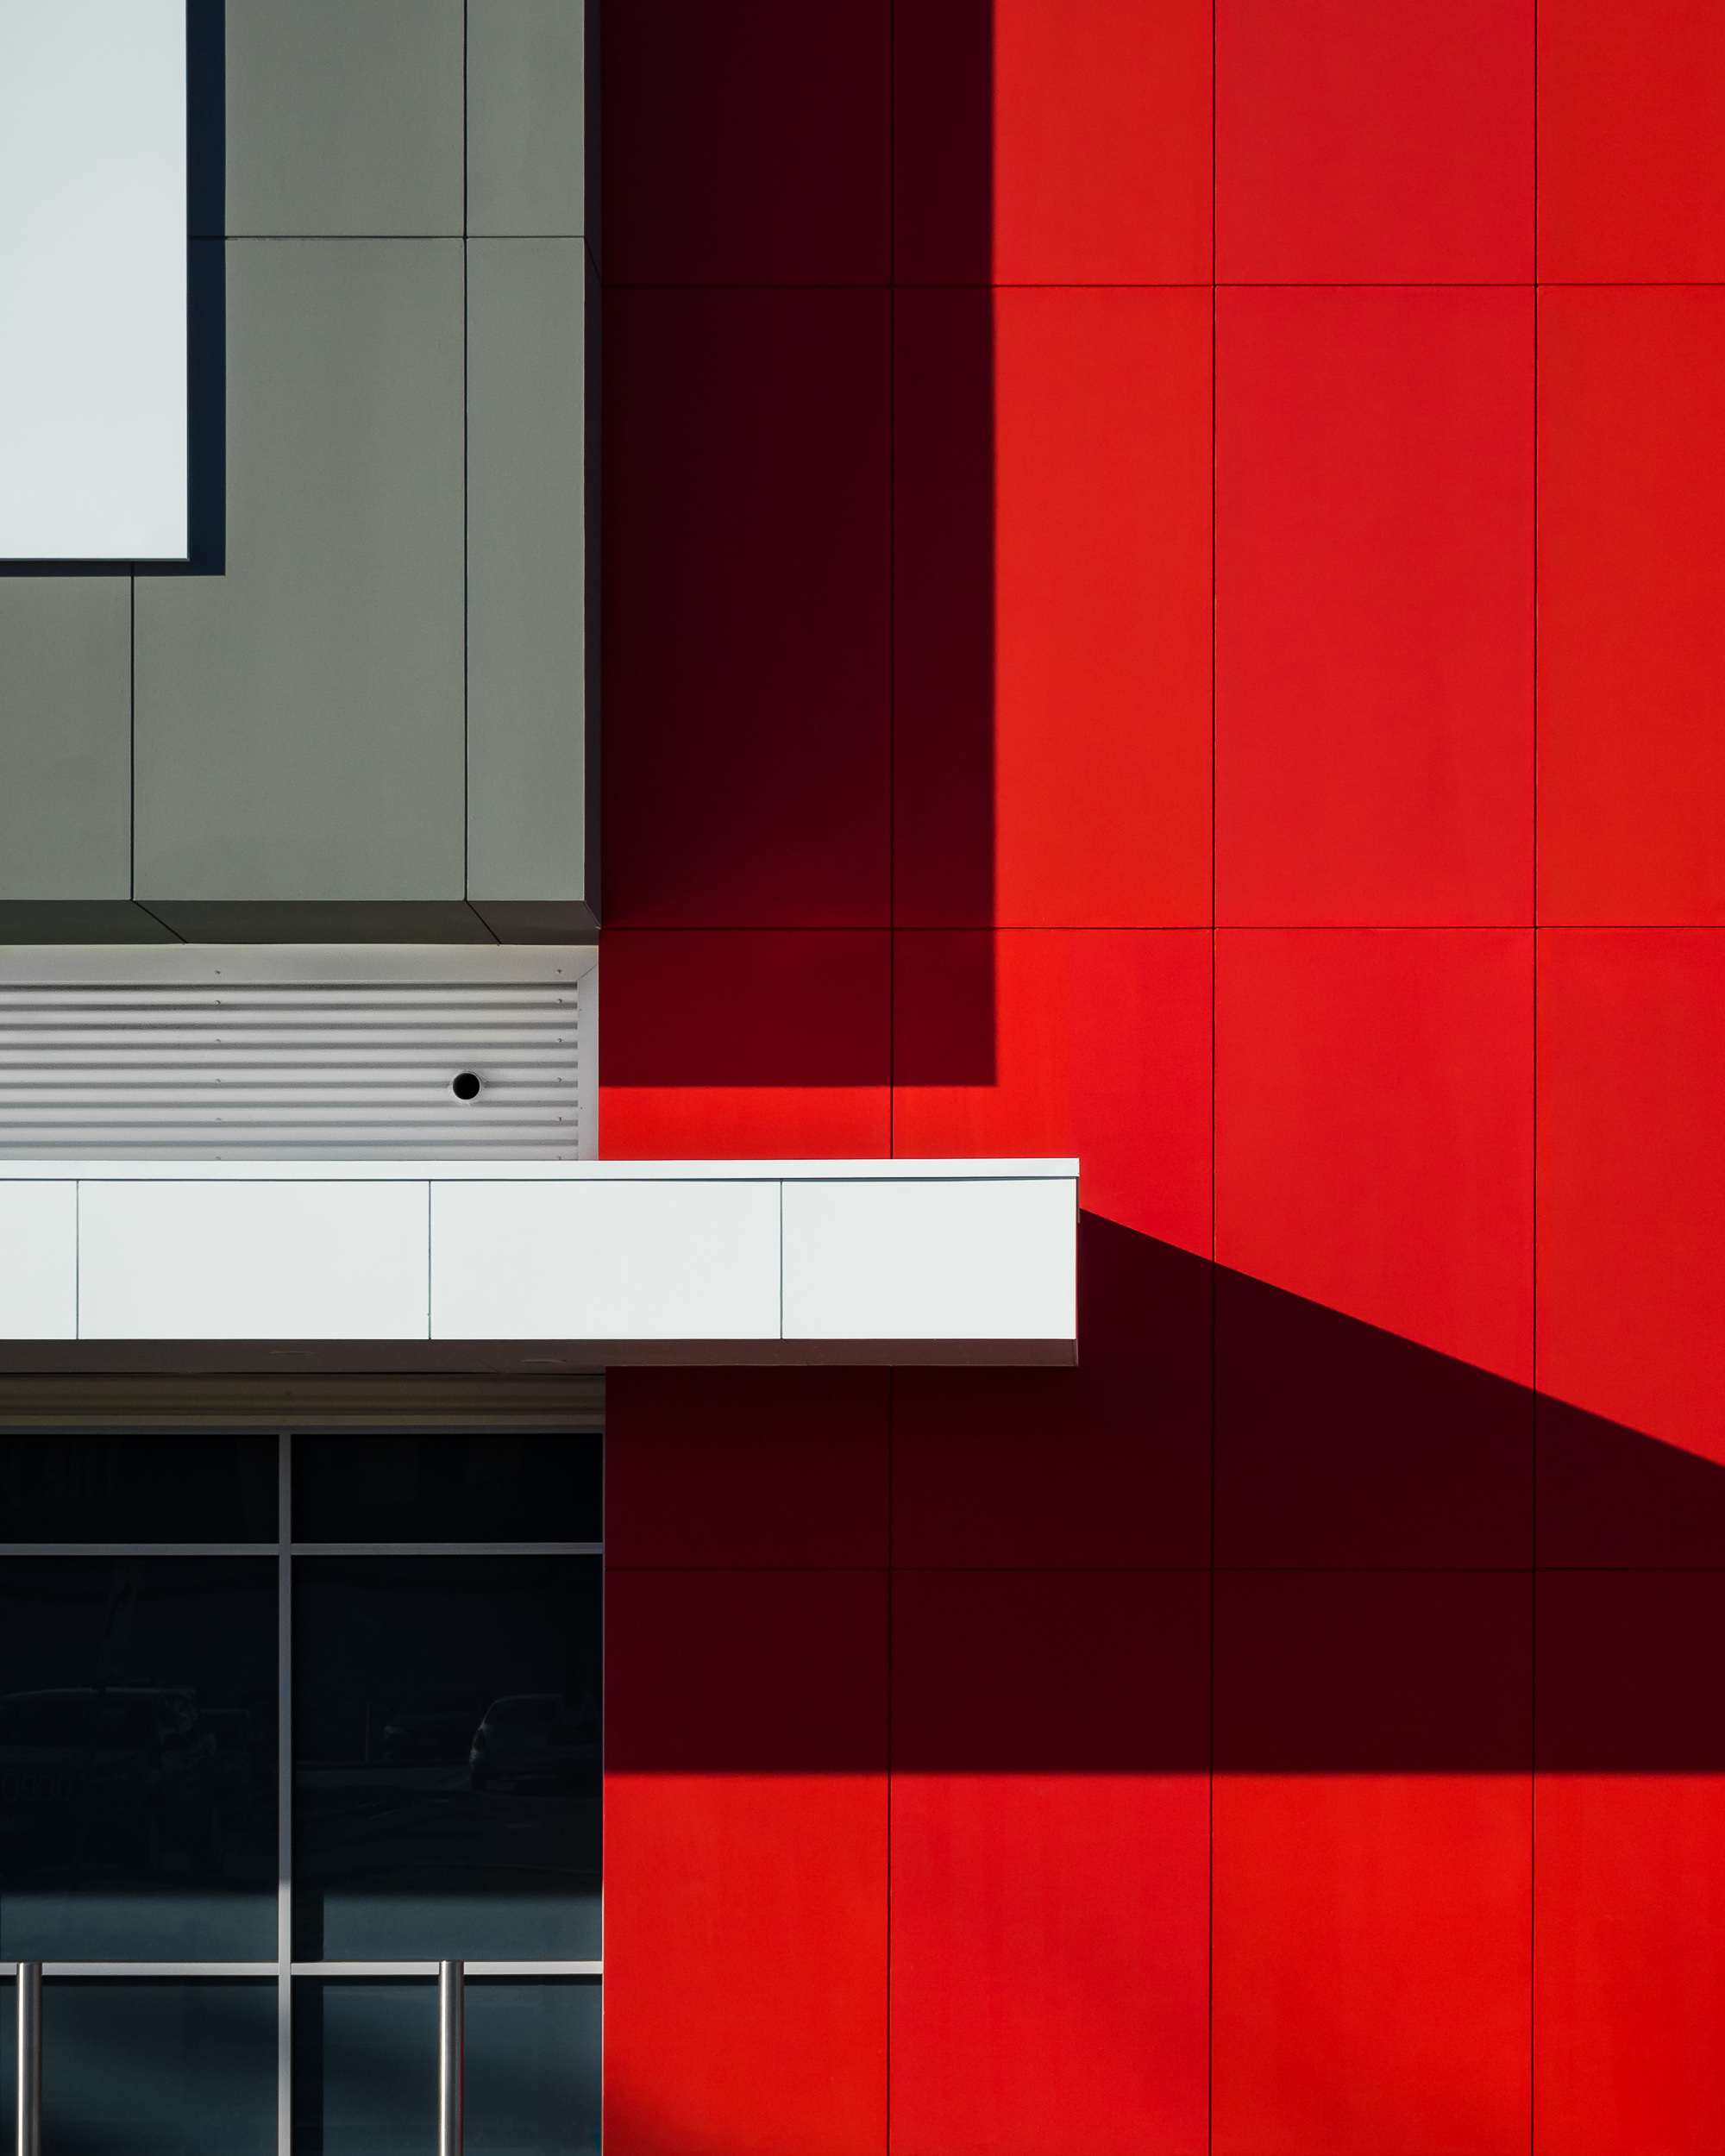 Urbanscape 10